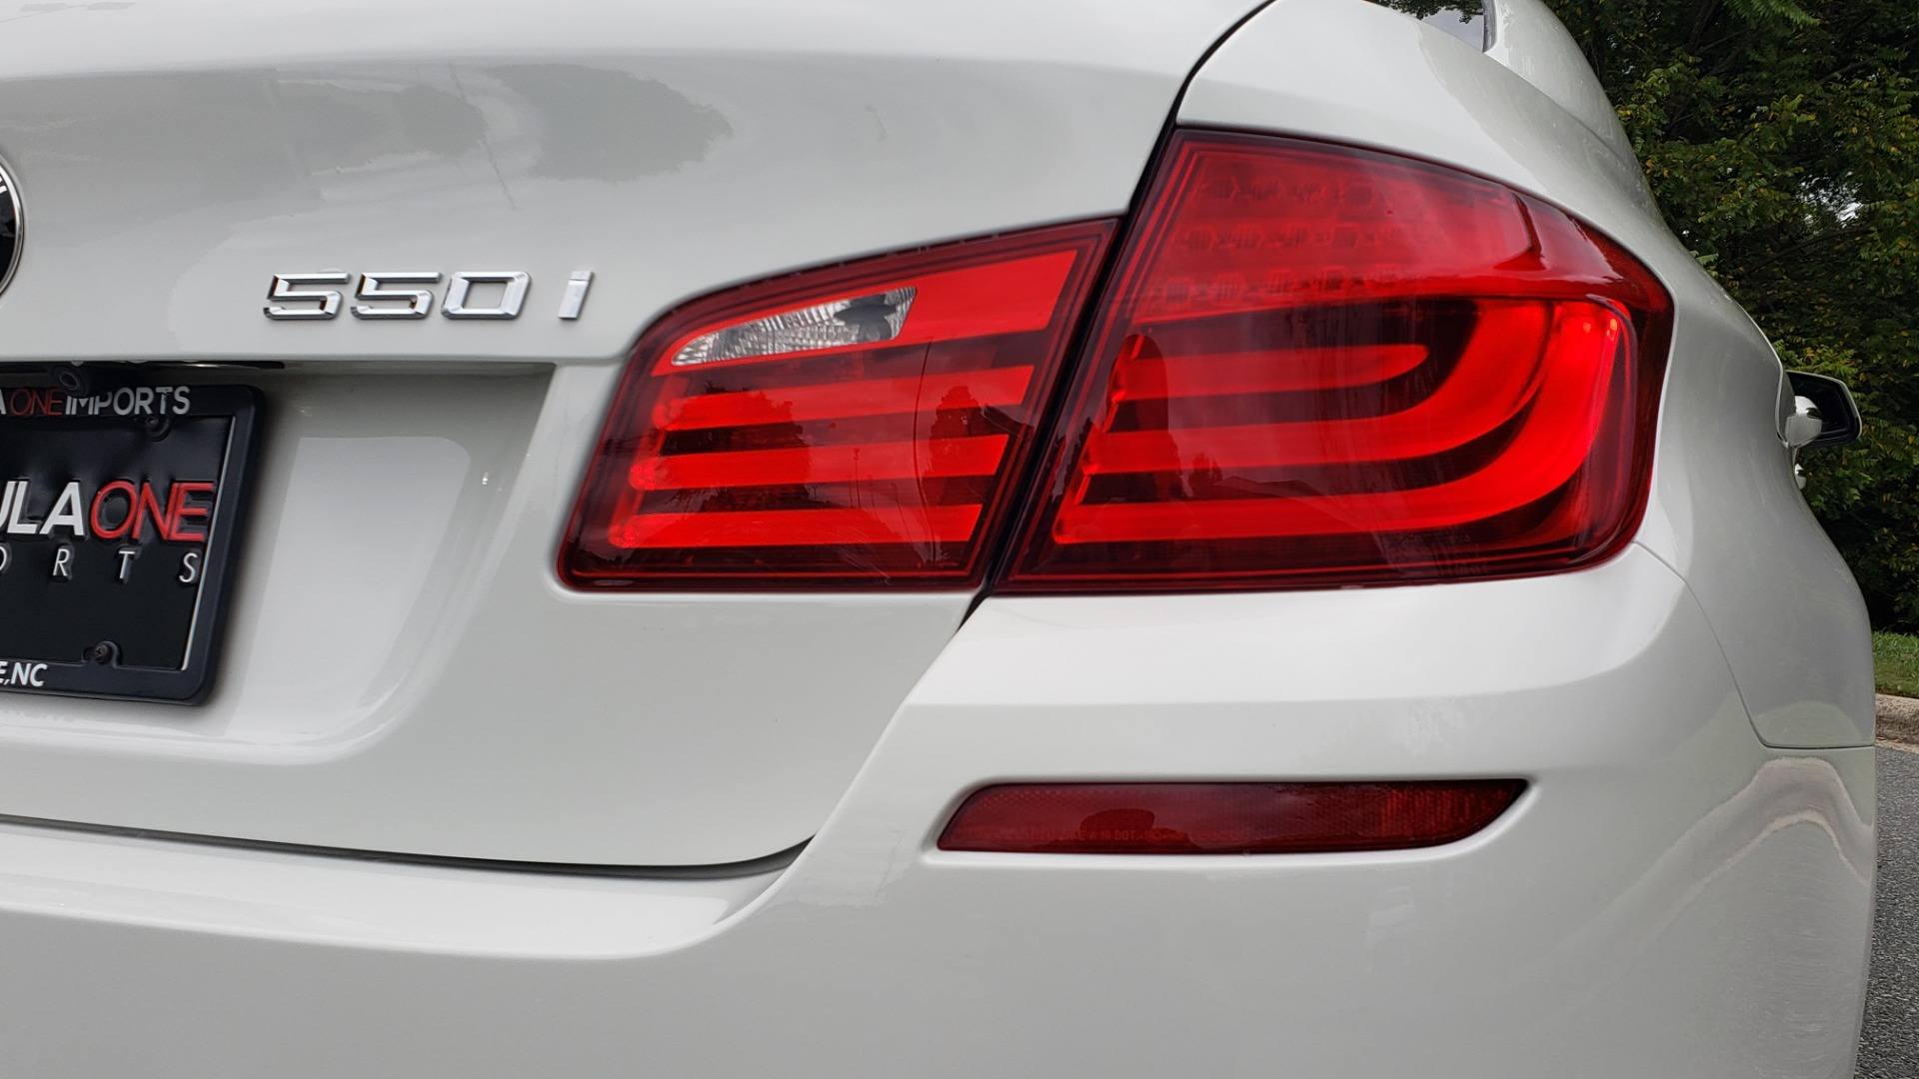 Used 2012 BMW 5 SERIES 550I M SPORT / NAV / CONV PKG / SUNROOF / PREM SND / REARVIEW for sale Sold at Formula Imports in Charlotte NC 28227 26